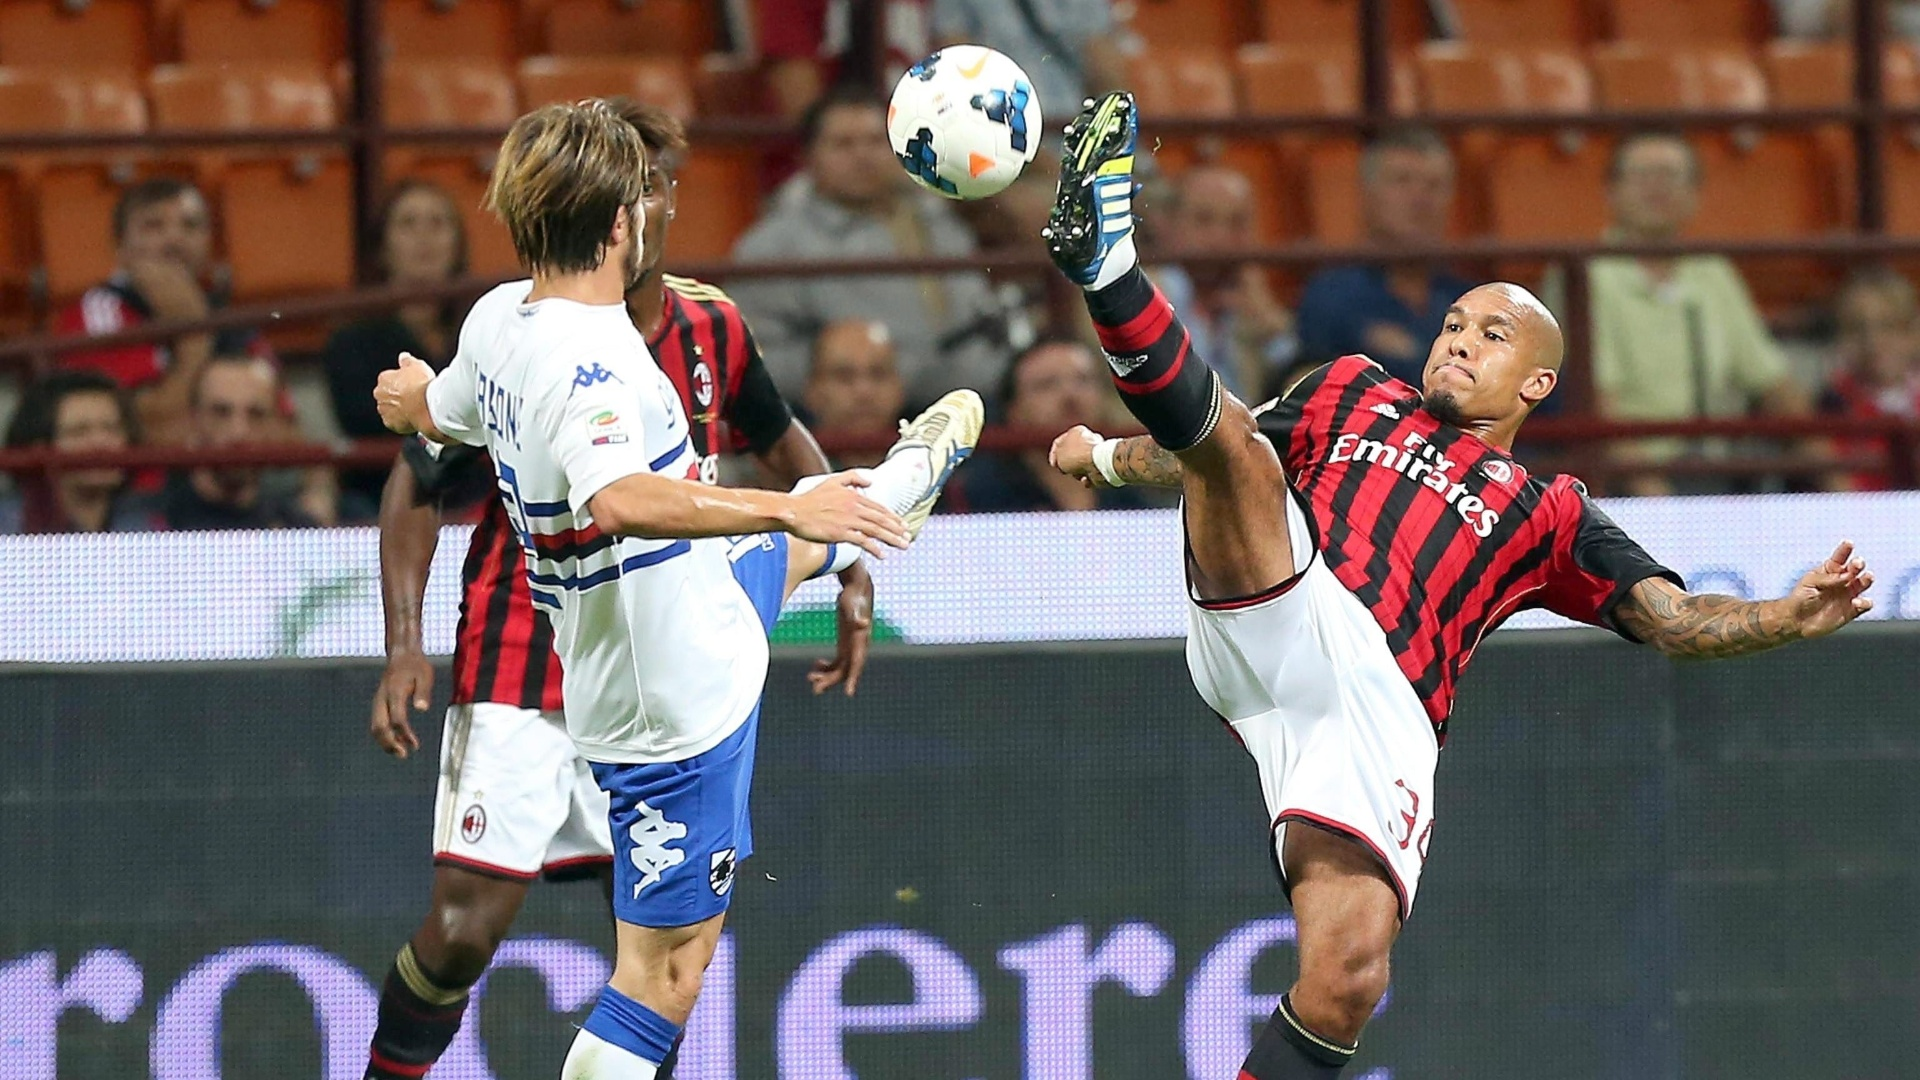 28.set.2013 - De Jong, do Milan, disputa a bola com Gianluca Sansone, do Sampdoria